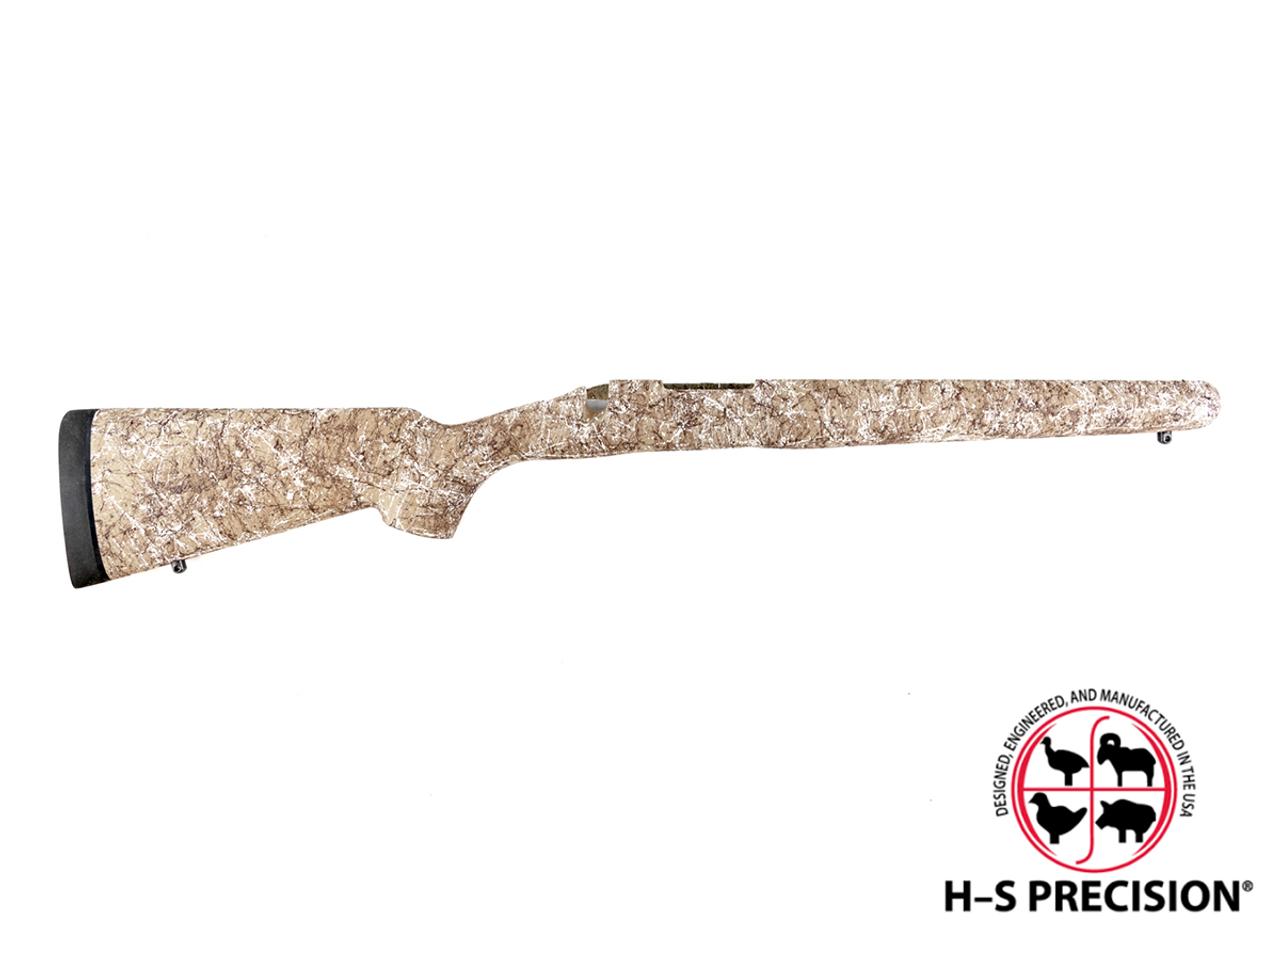 HS Precision PSS003 & 010 Pro Series Sporter - Remington 700